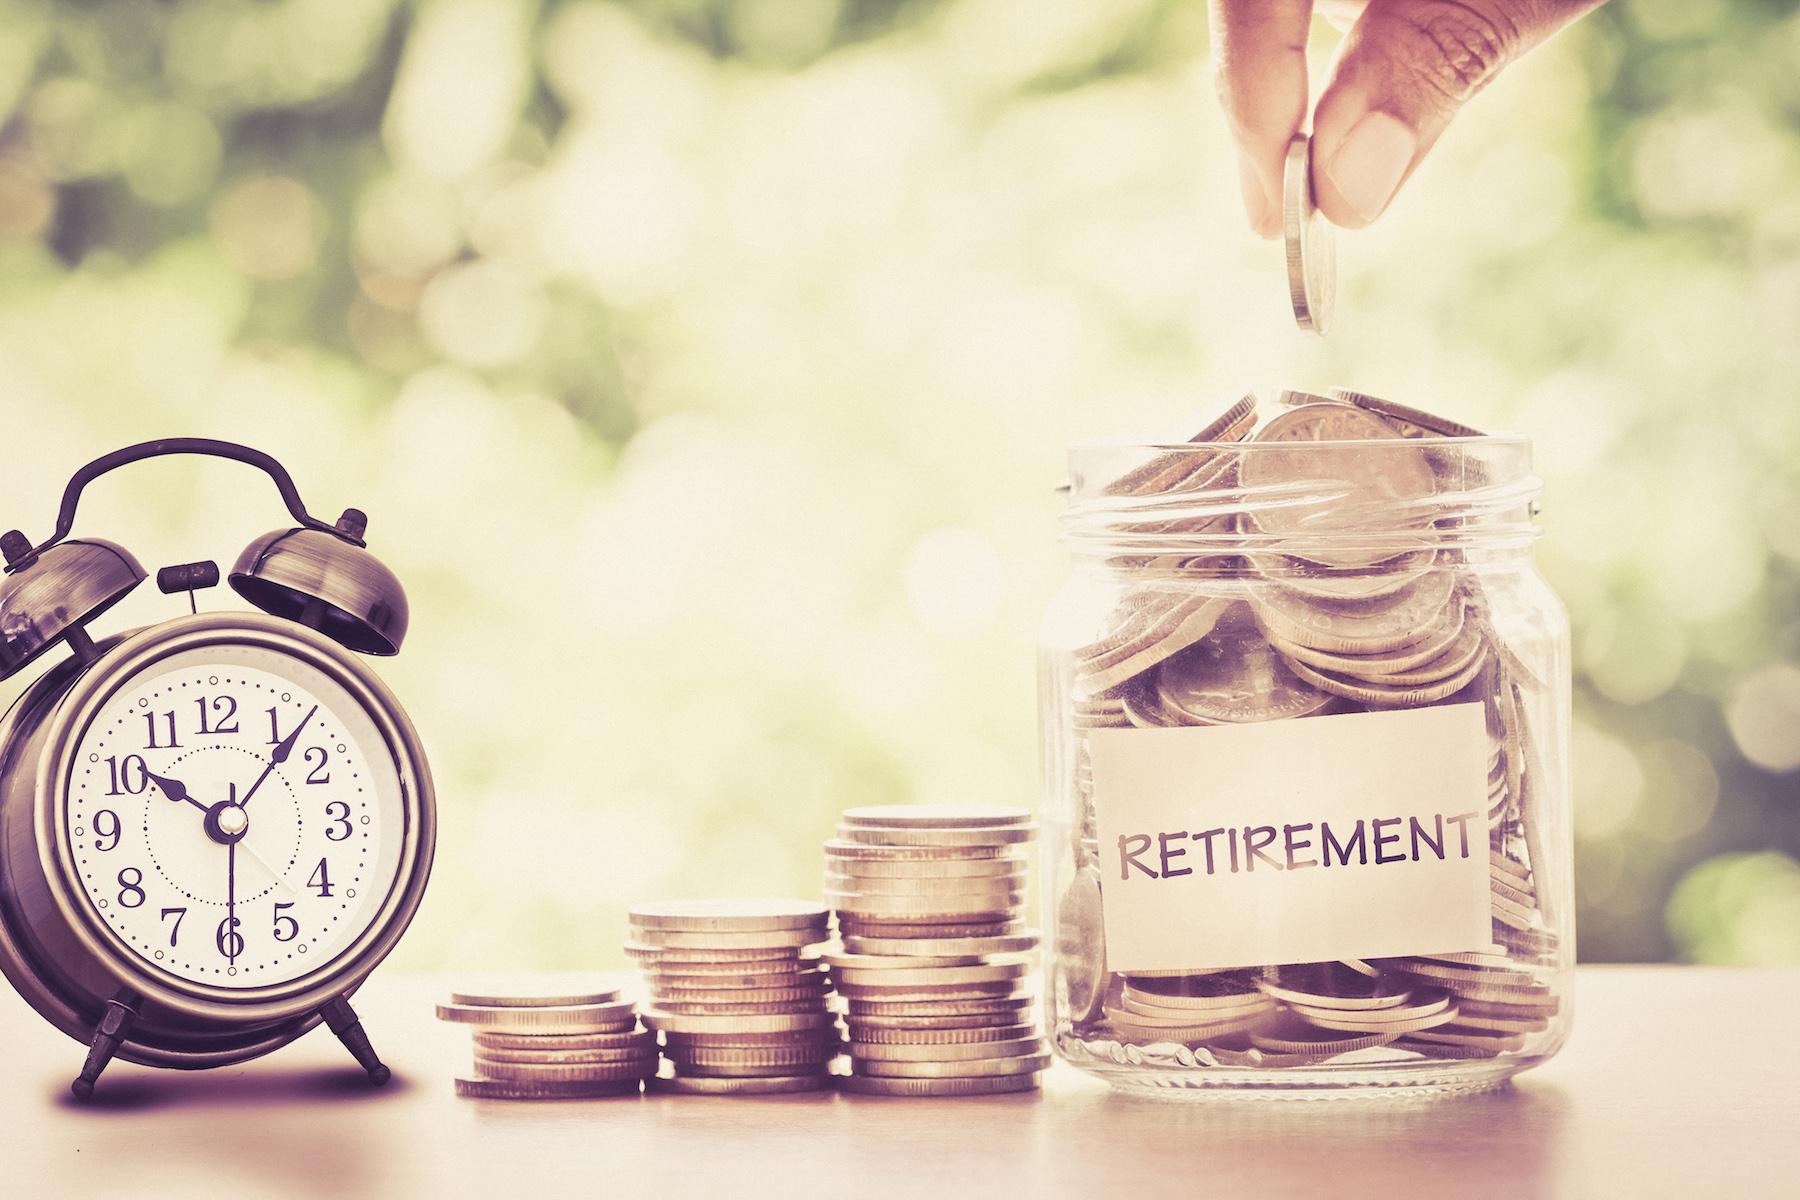 Retirement jar of money